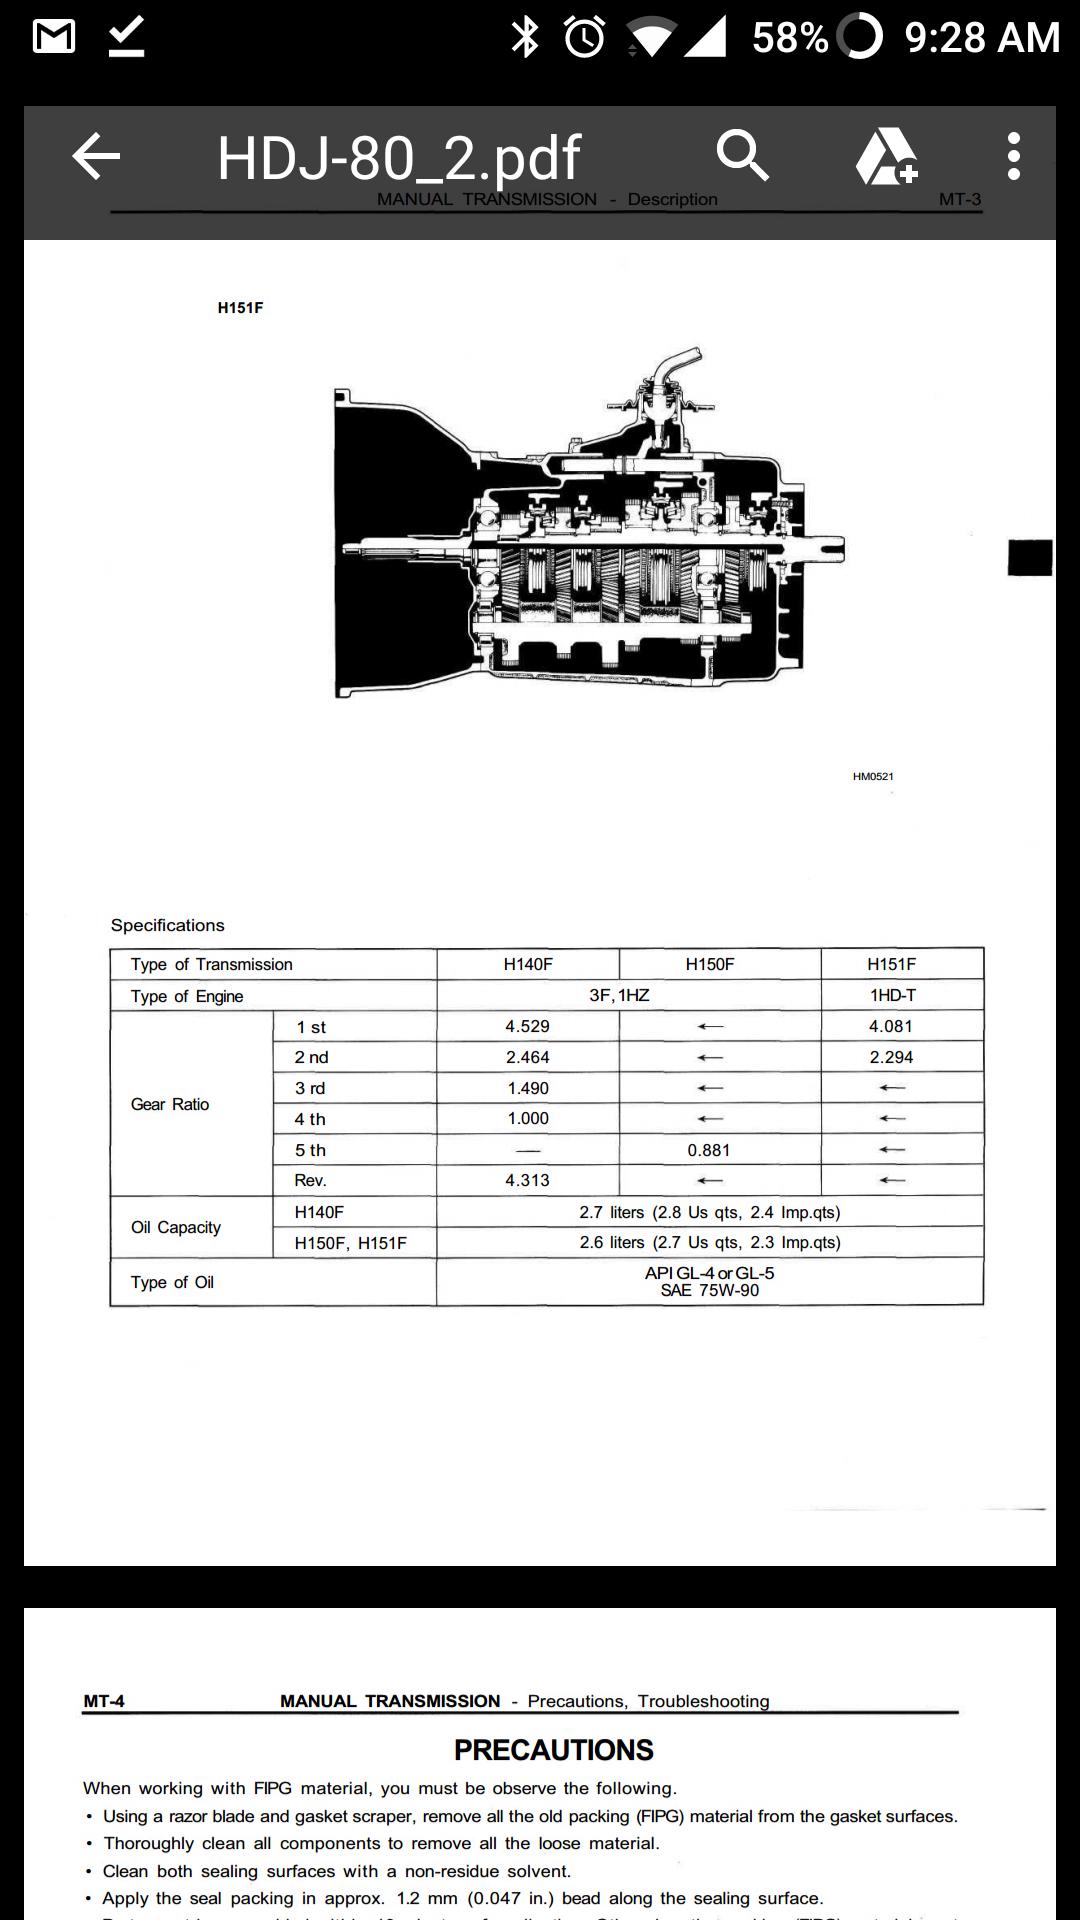 Screenshot_20170127-092840.png